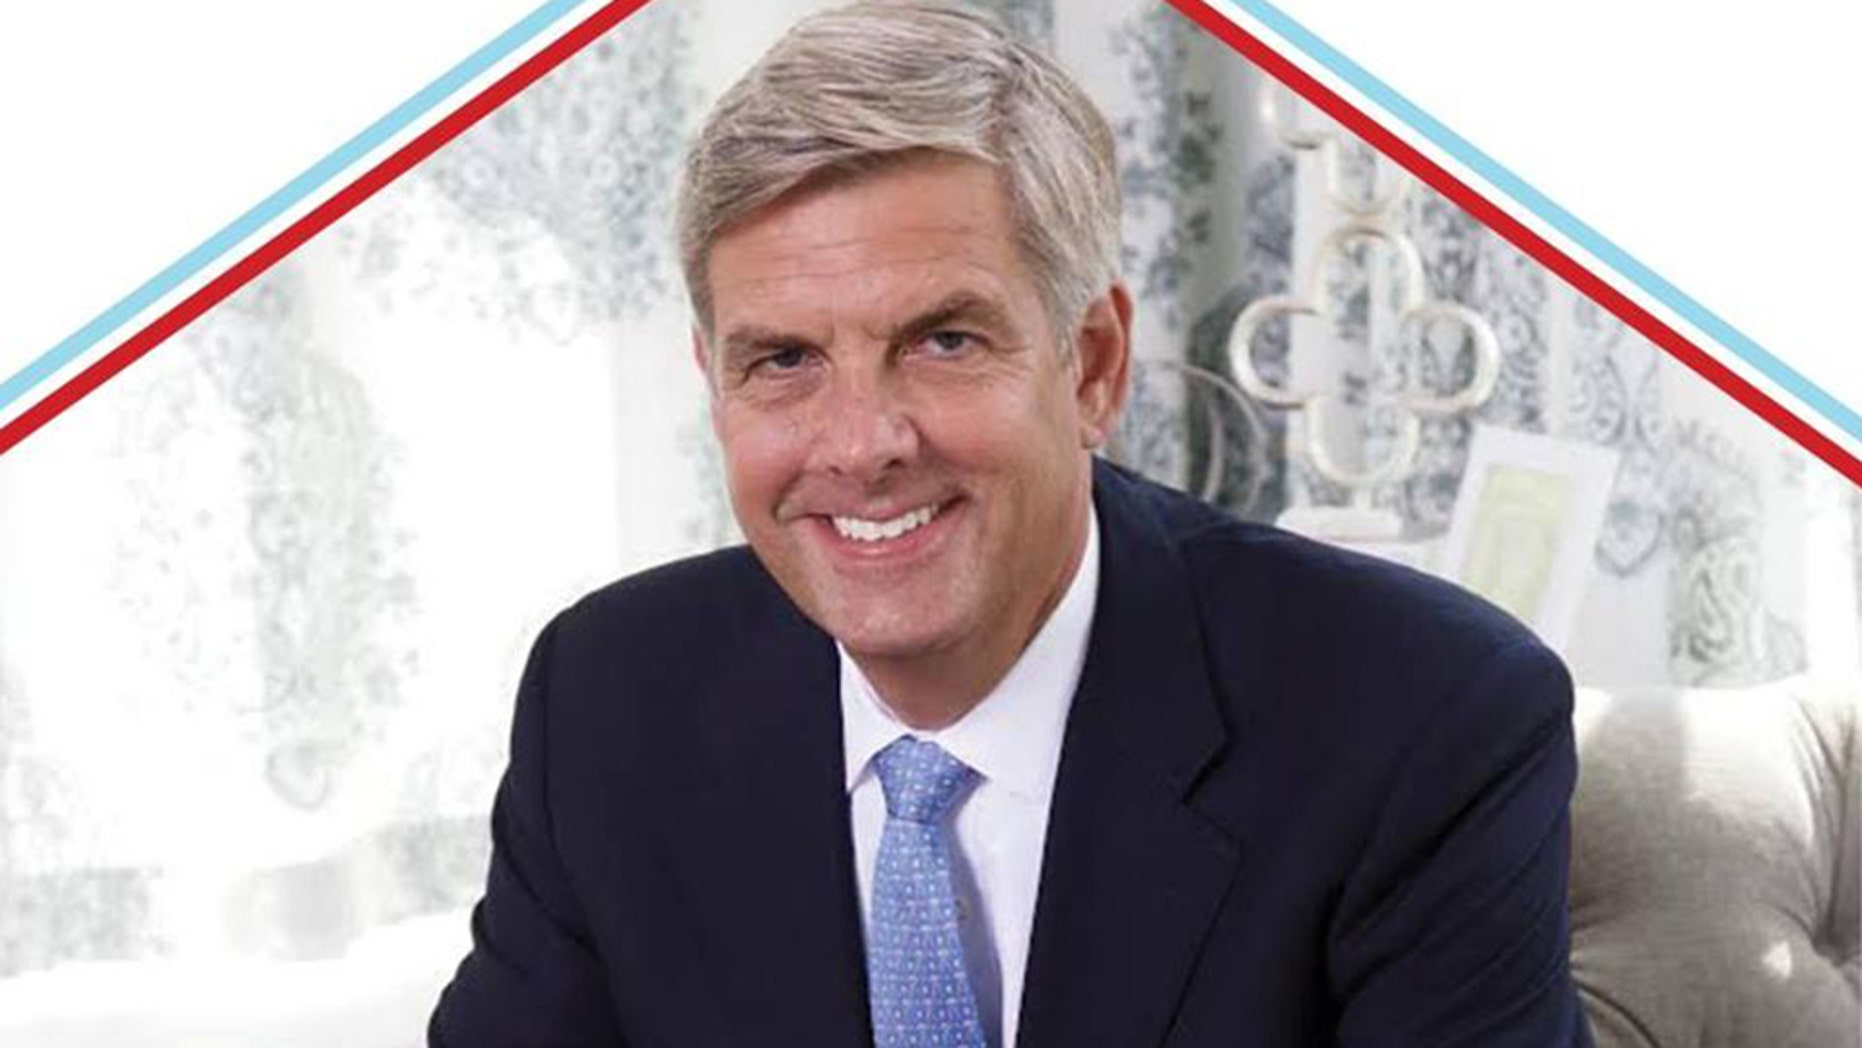 Republican gubernatorial candidate Bob Stefanowski is running on a Trumpian economic policy